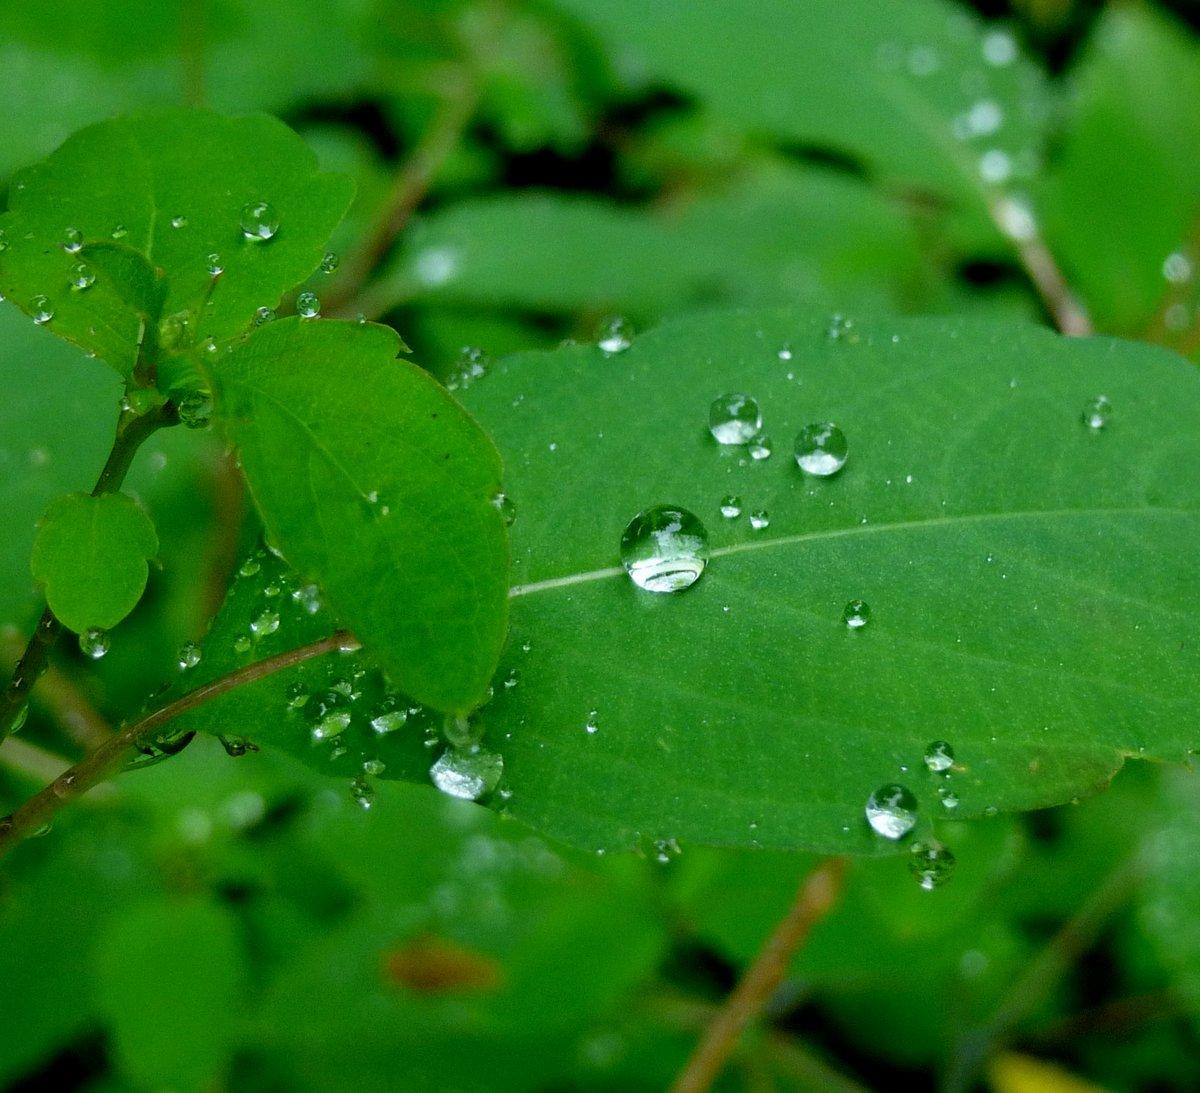 8. Raindrops on Jewelweed